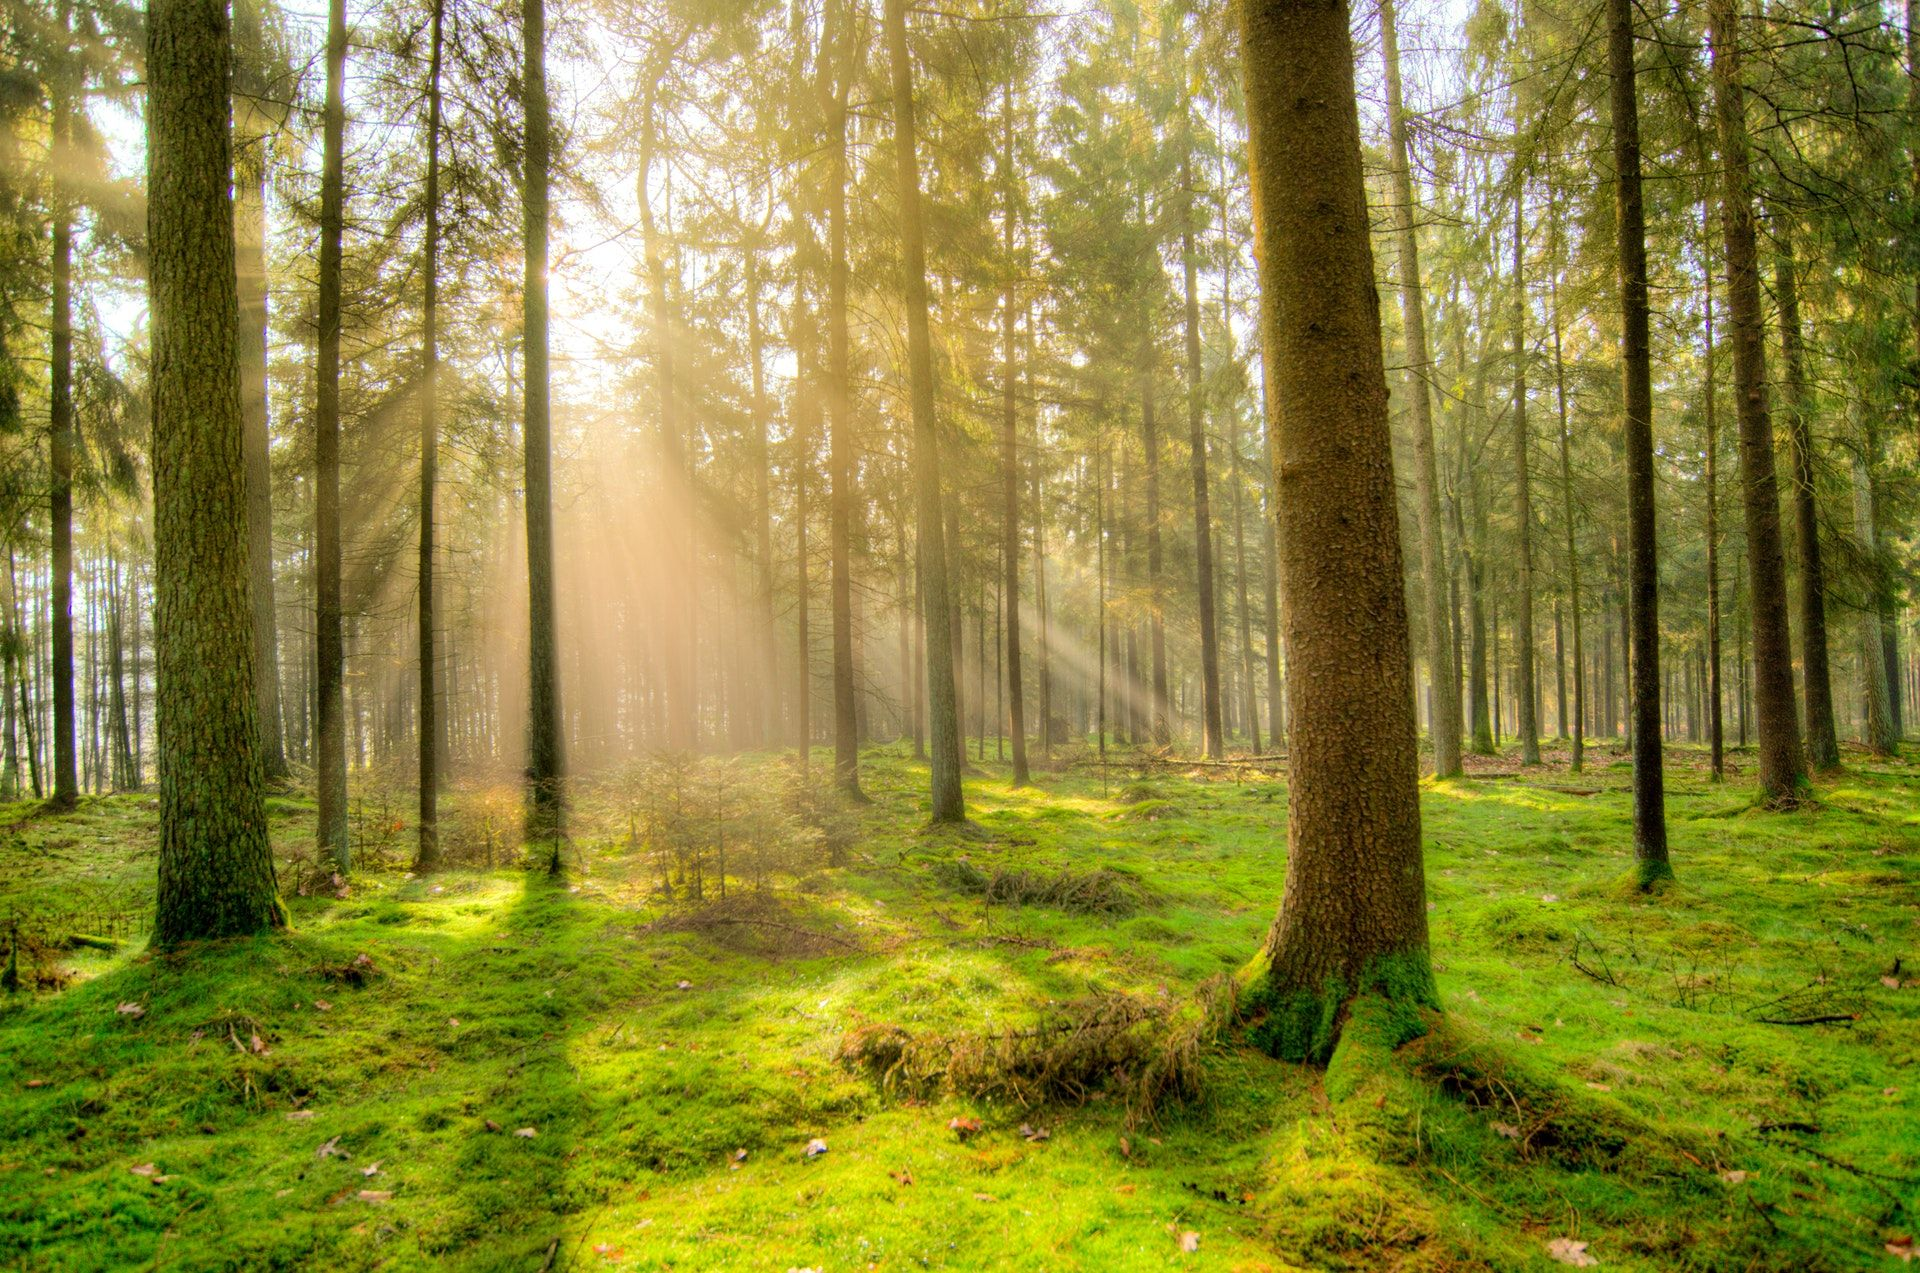 عکس زمینه تنه درختان جنگل سبز پس زمینه